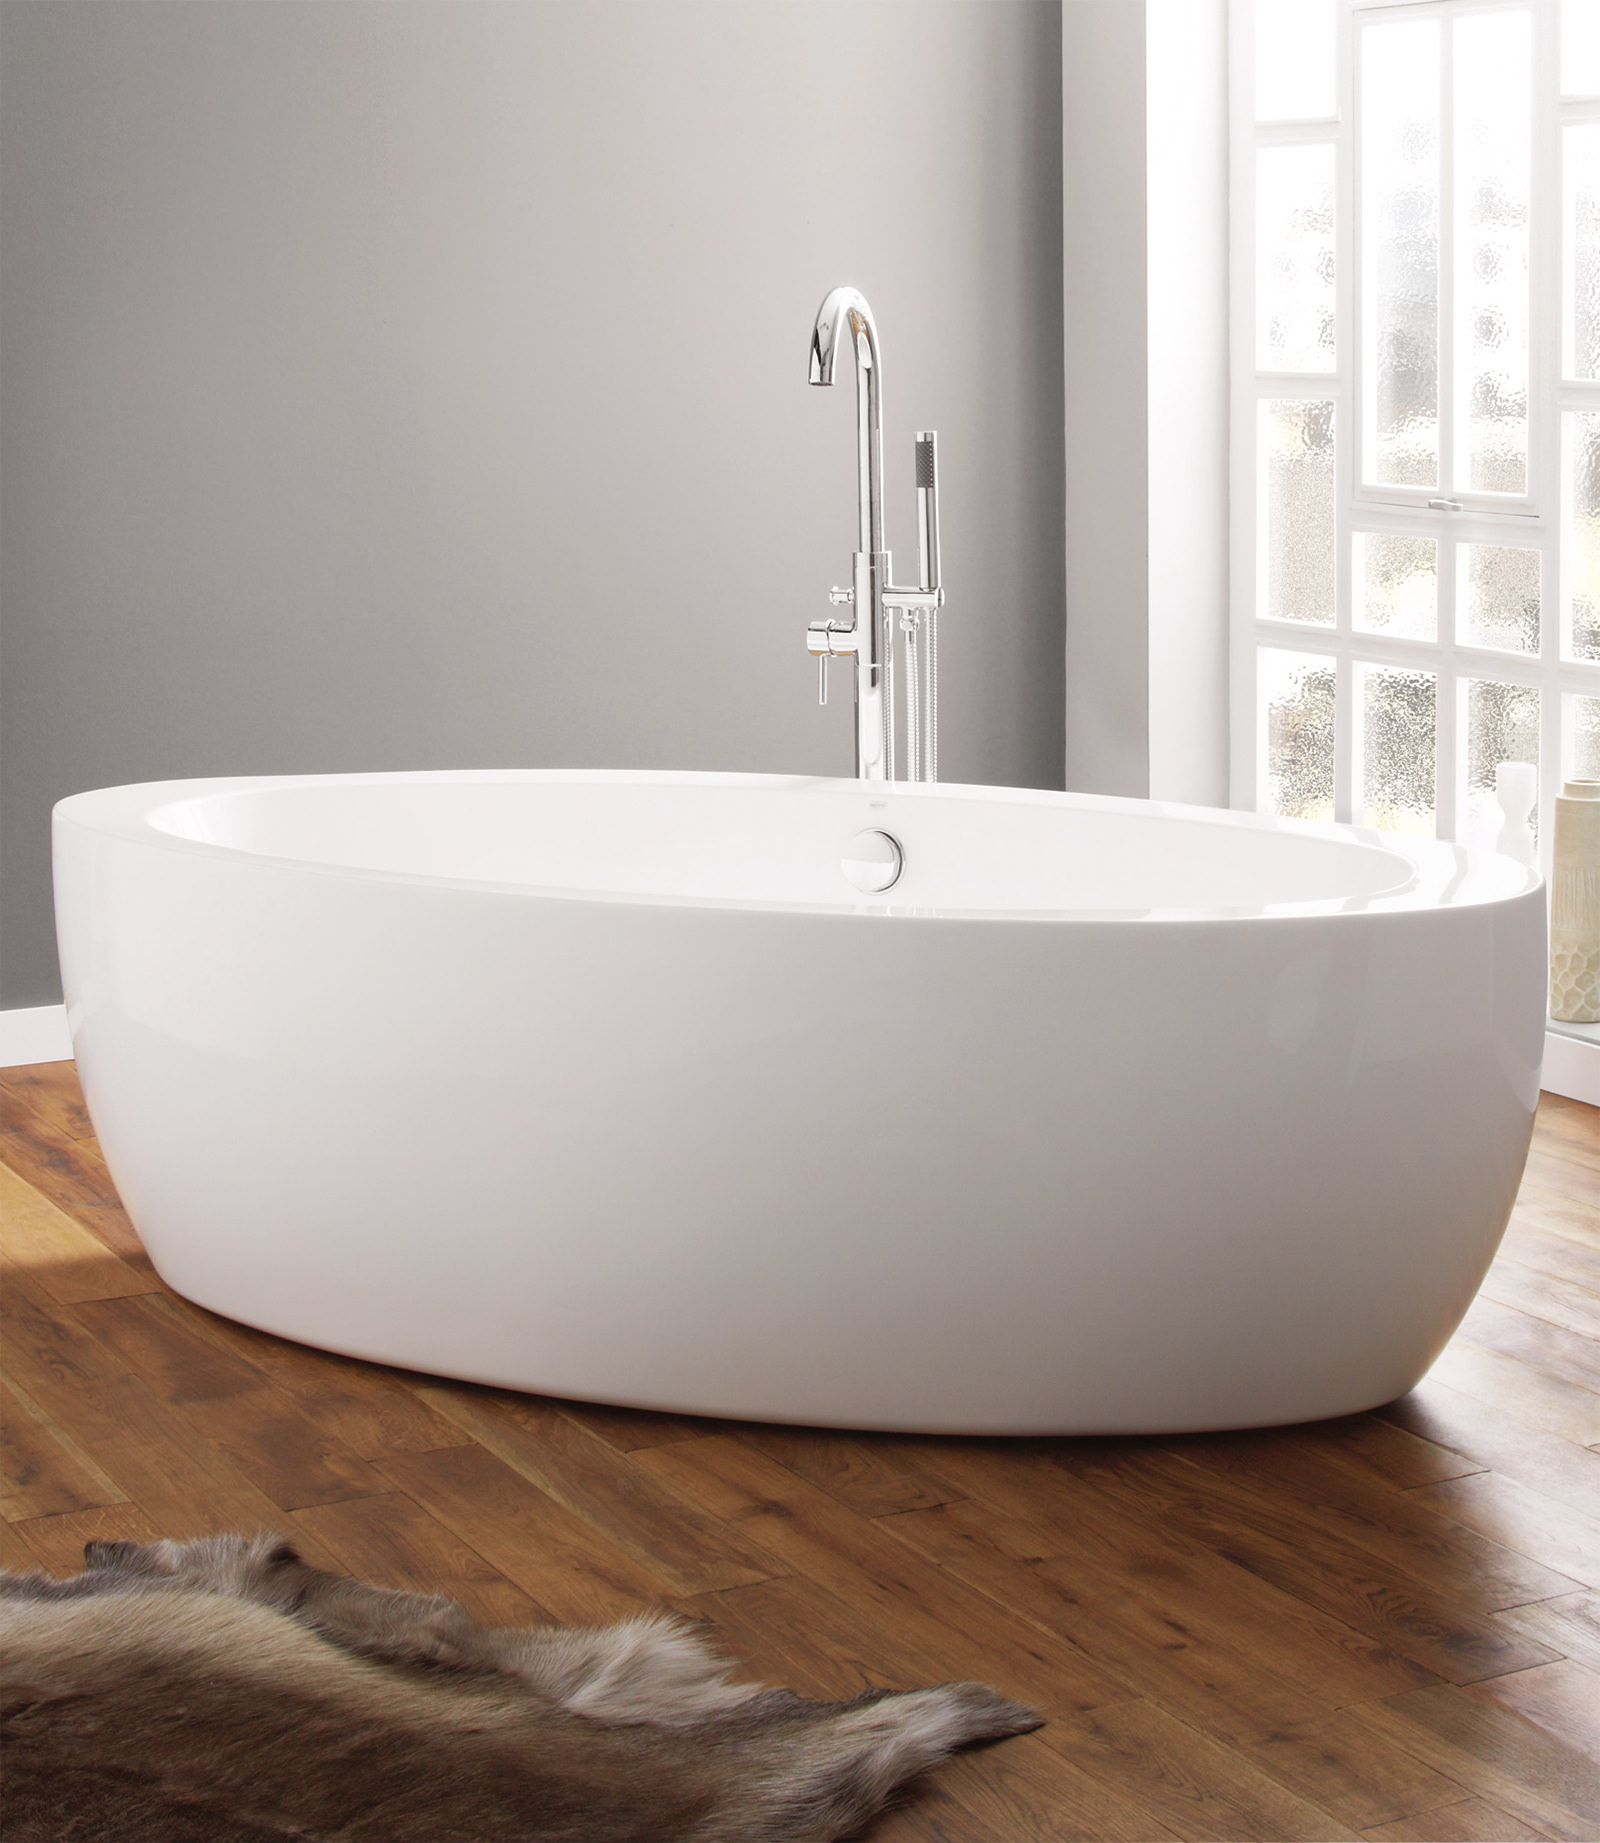 April Halton 1850 X 910mm Contemporary Freestanding Bath